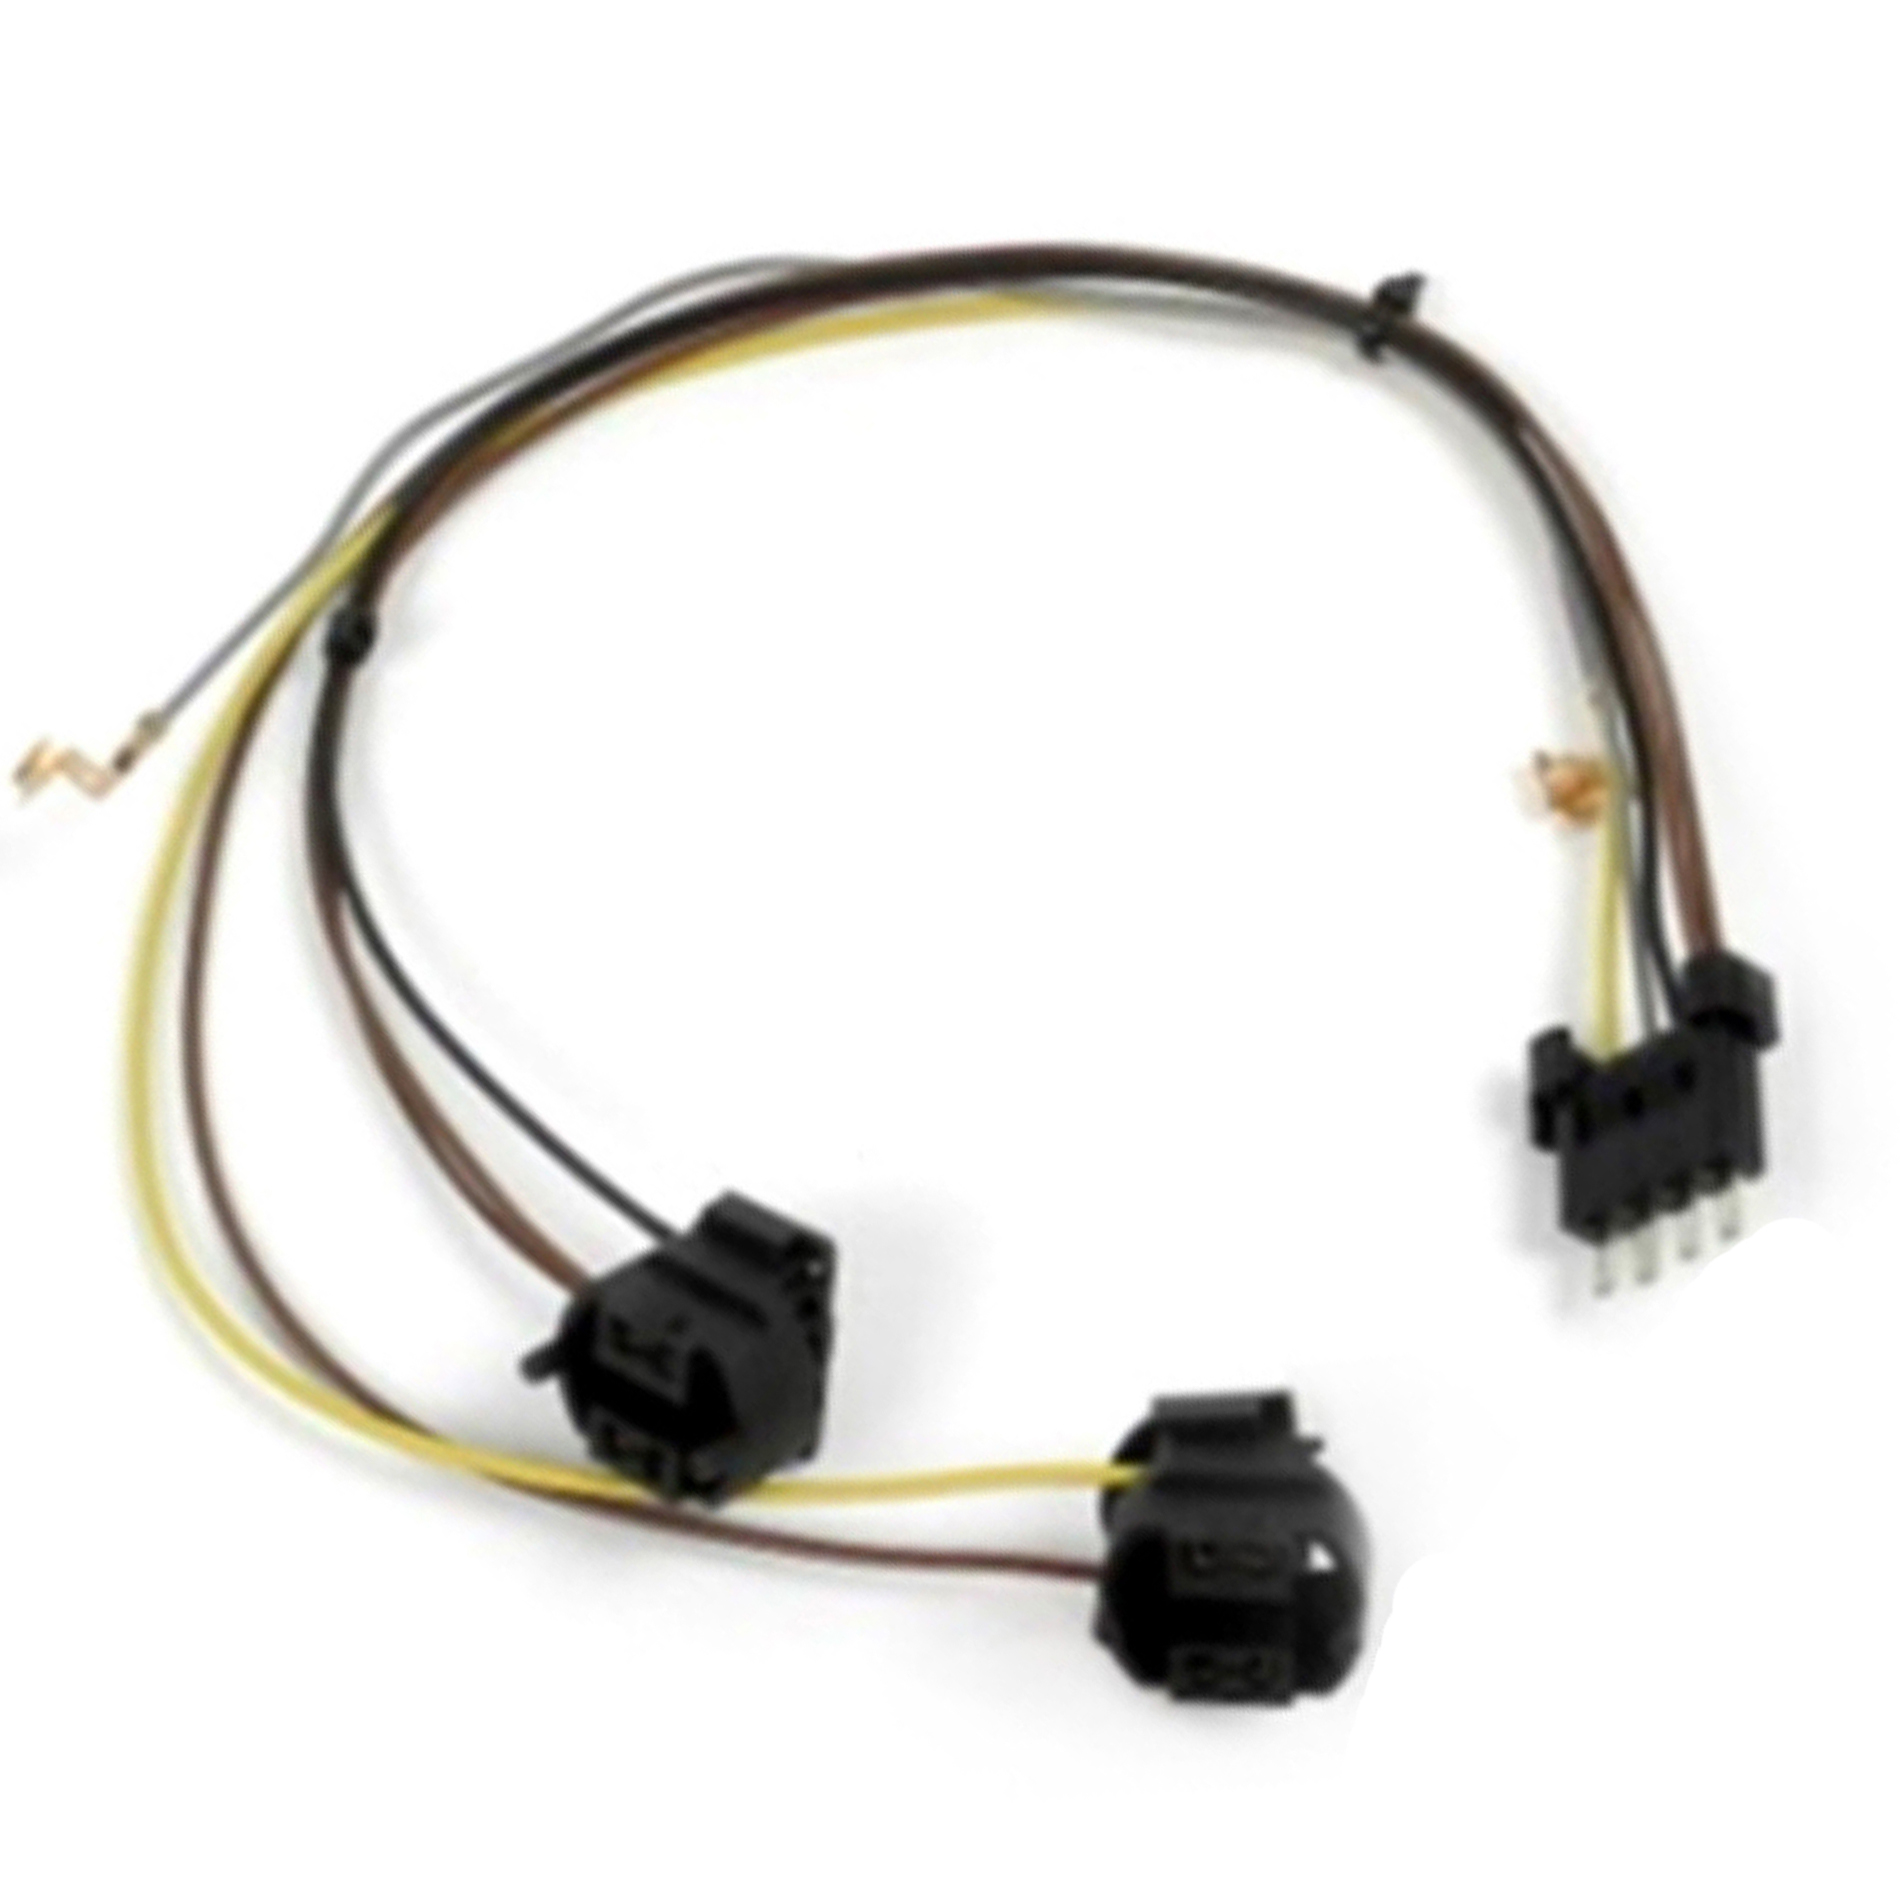 hight resolution of for right passenger side mercedes benz ml350 ml320 ml550 w164 headlight wire harness repair kit 2006 2007 2008 2009 2010 walmart com